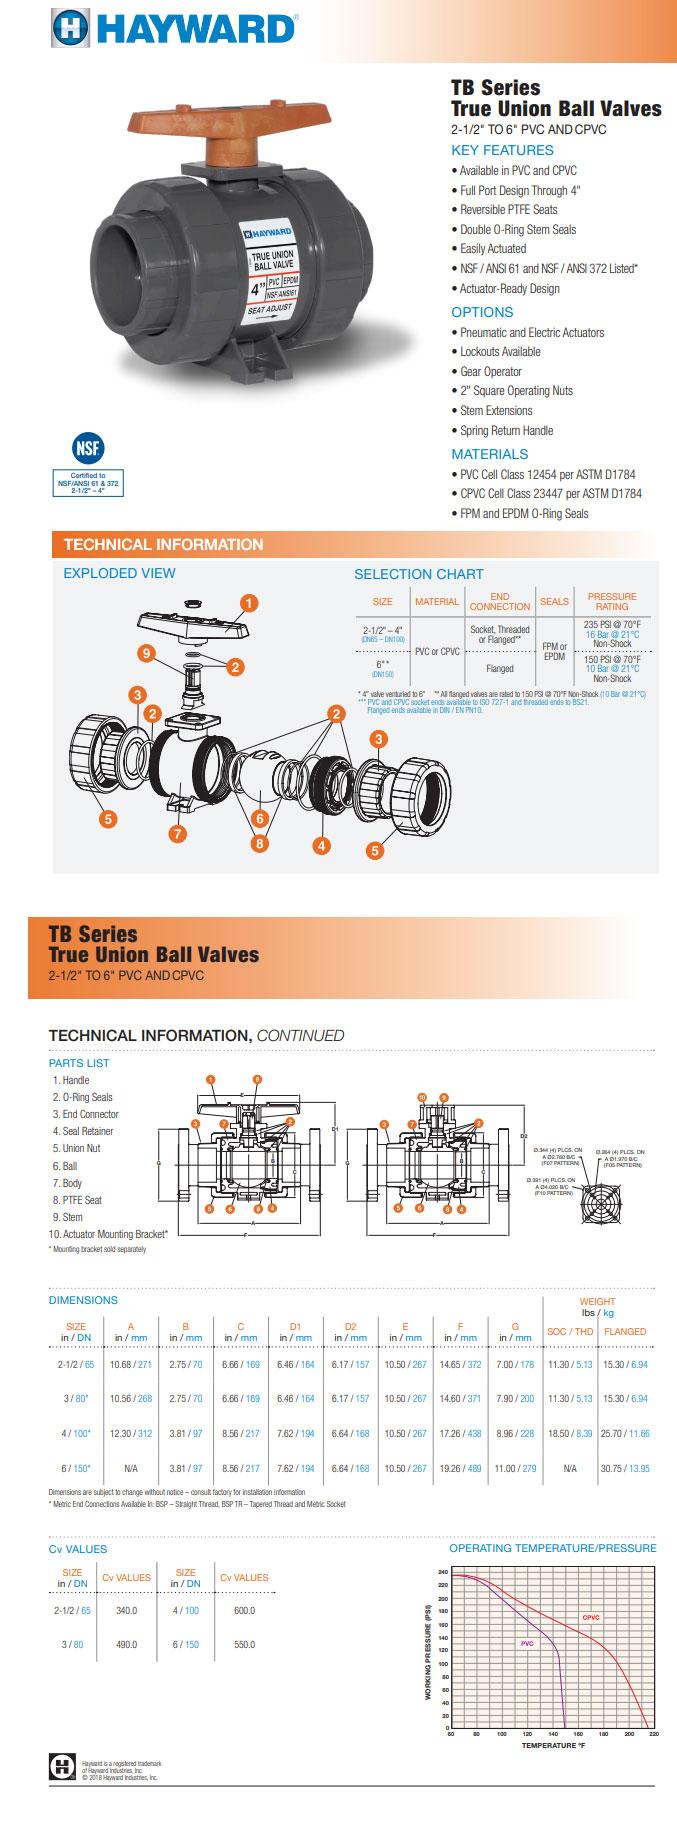 hytb-introduction-1.jpg